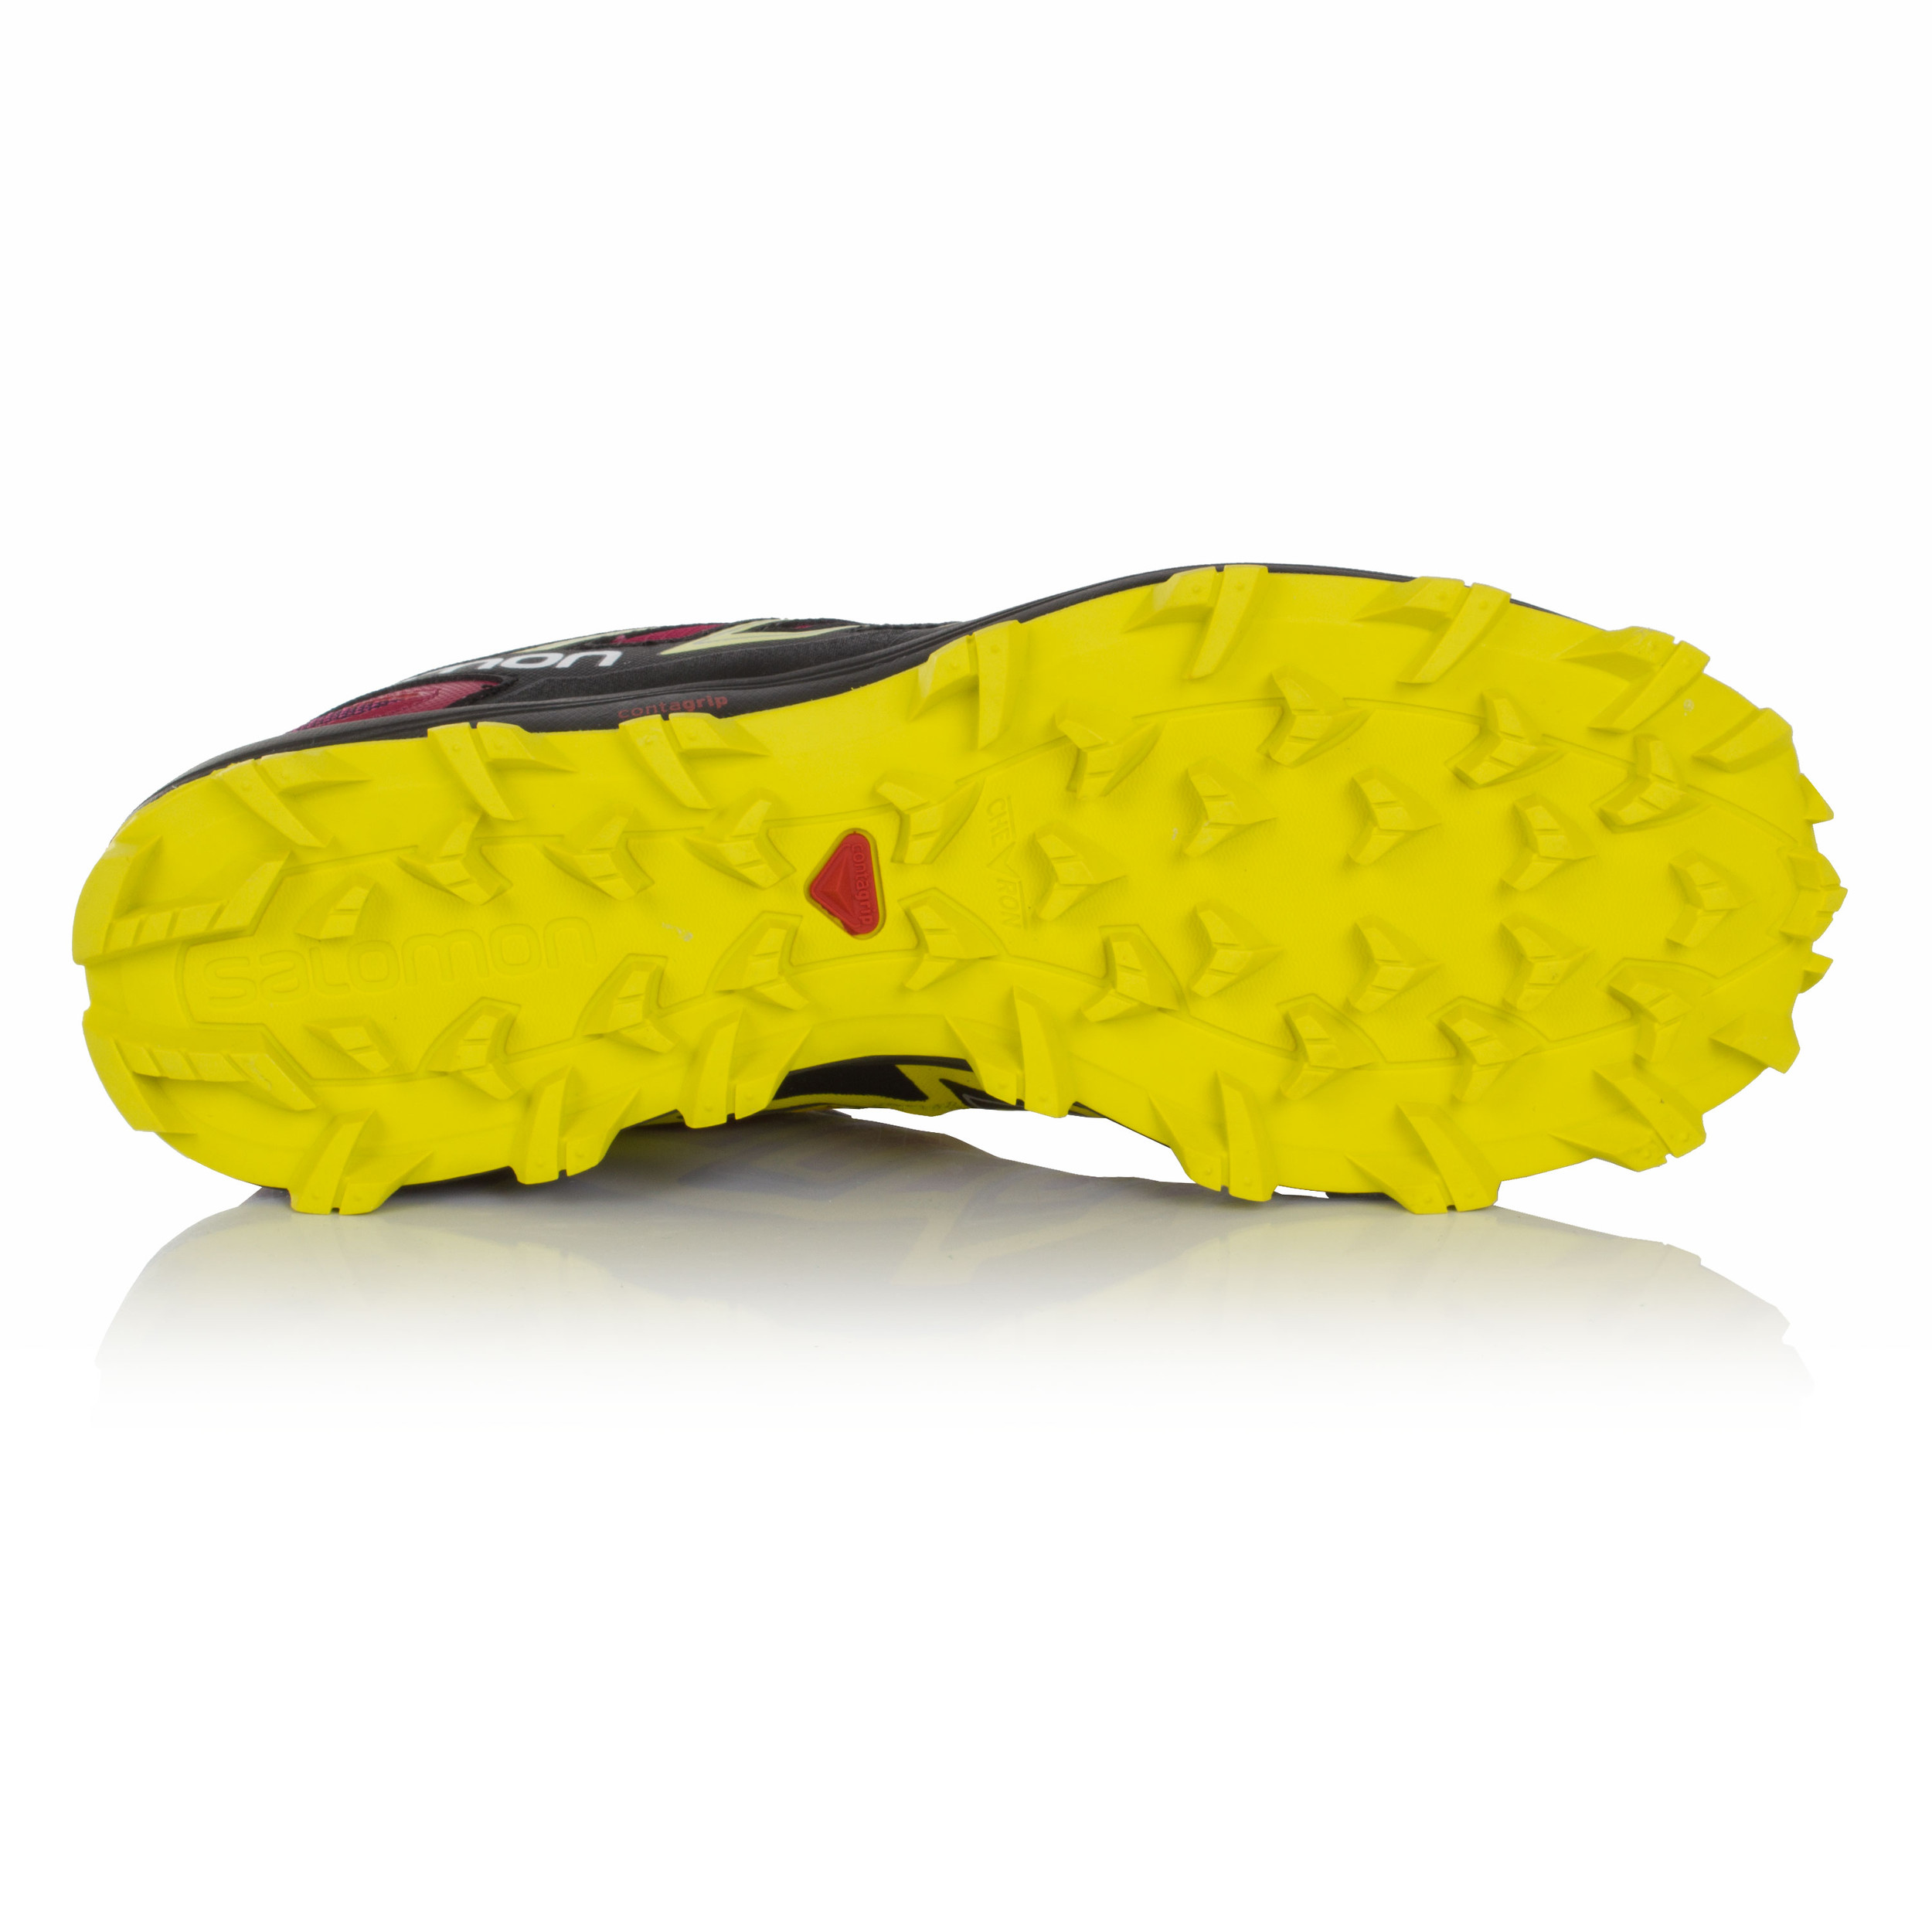 Salomon-Speedtrak-Mujer-Rosa-Negro-Resiste-Agua-Running-Zapatos-Zapatillas